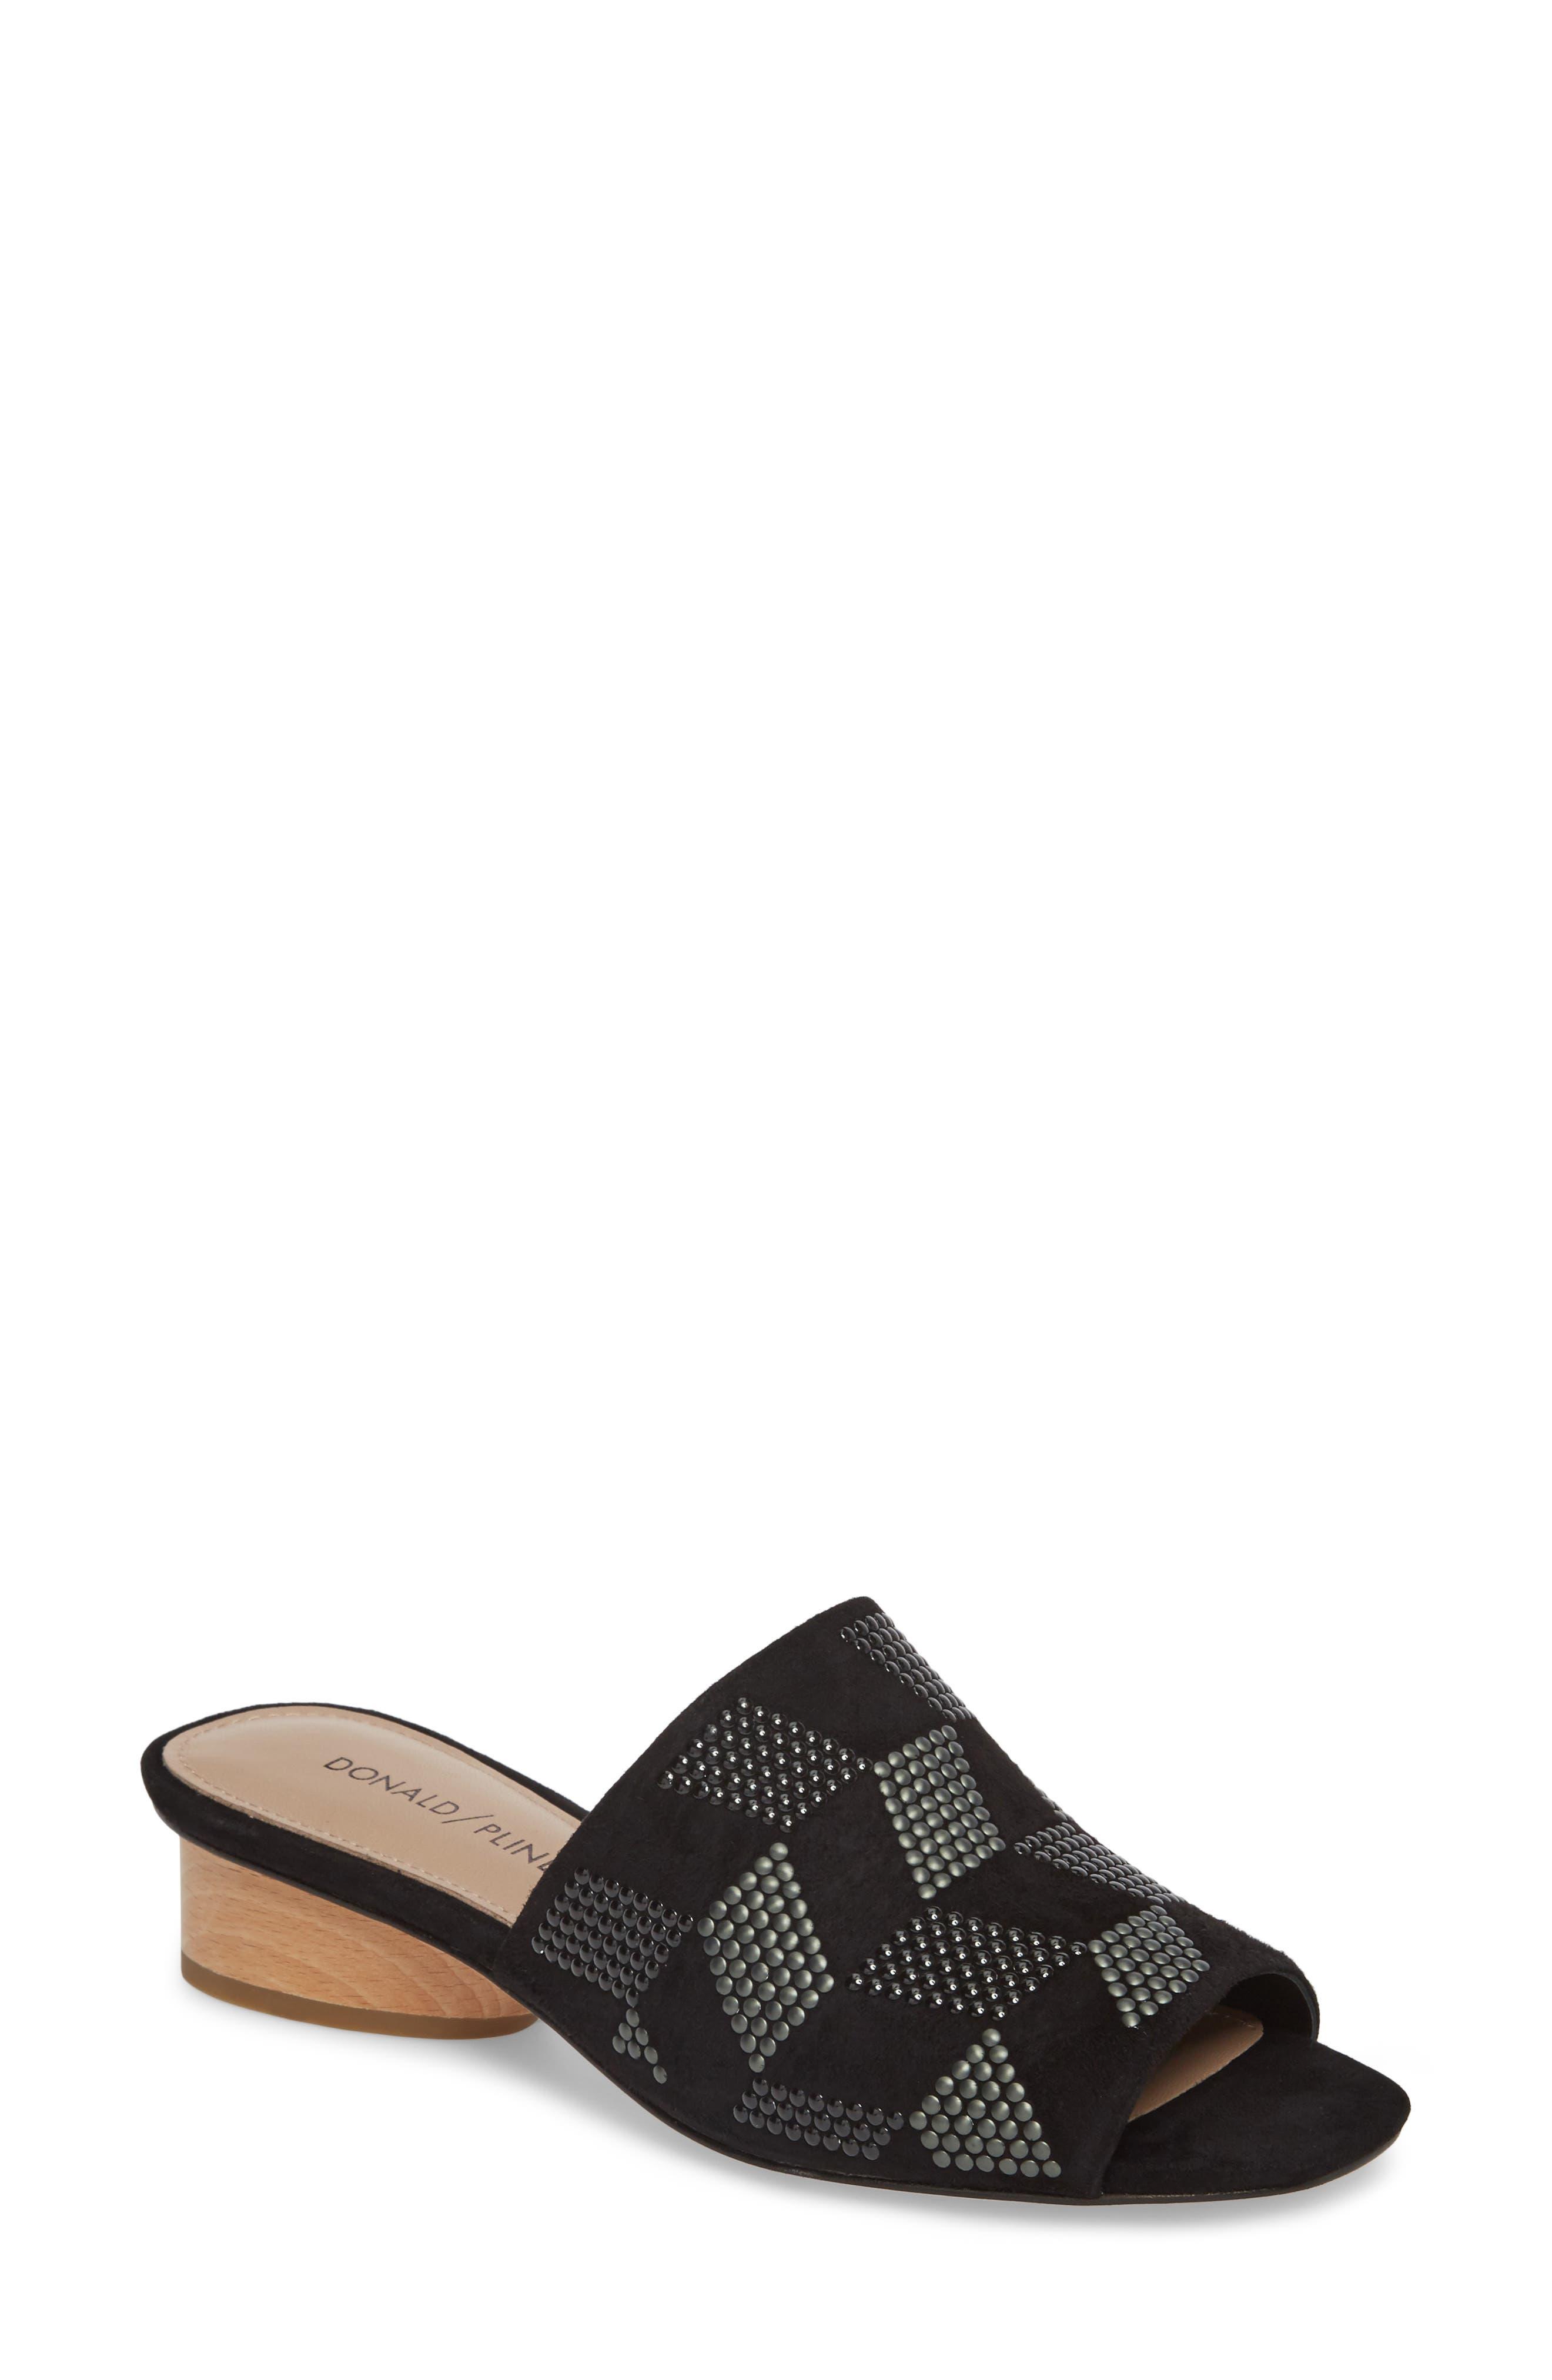 Rimini Slide Sandal,                         Main,                         color, Black Suede